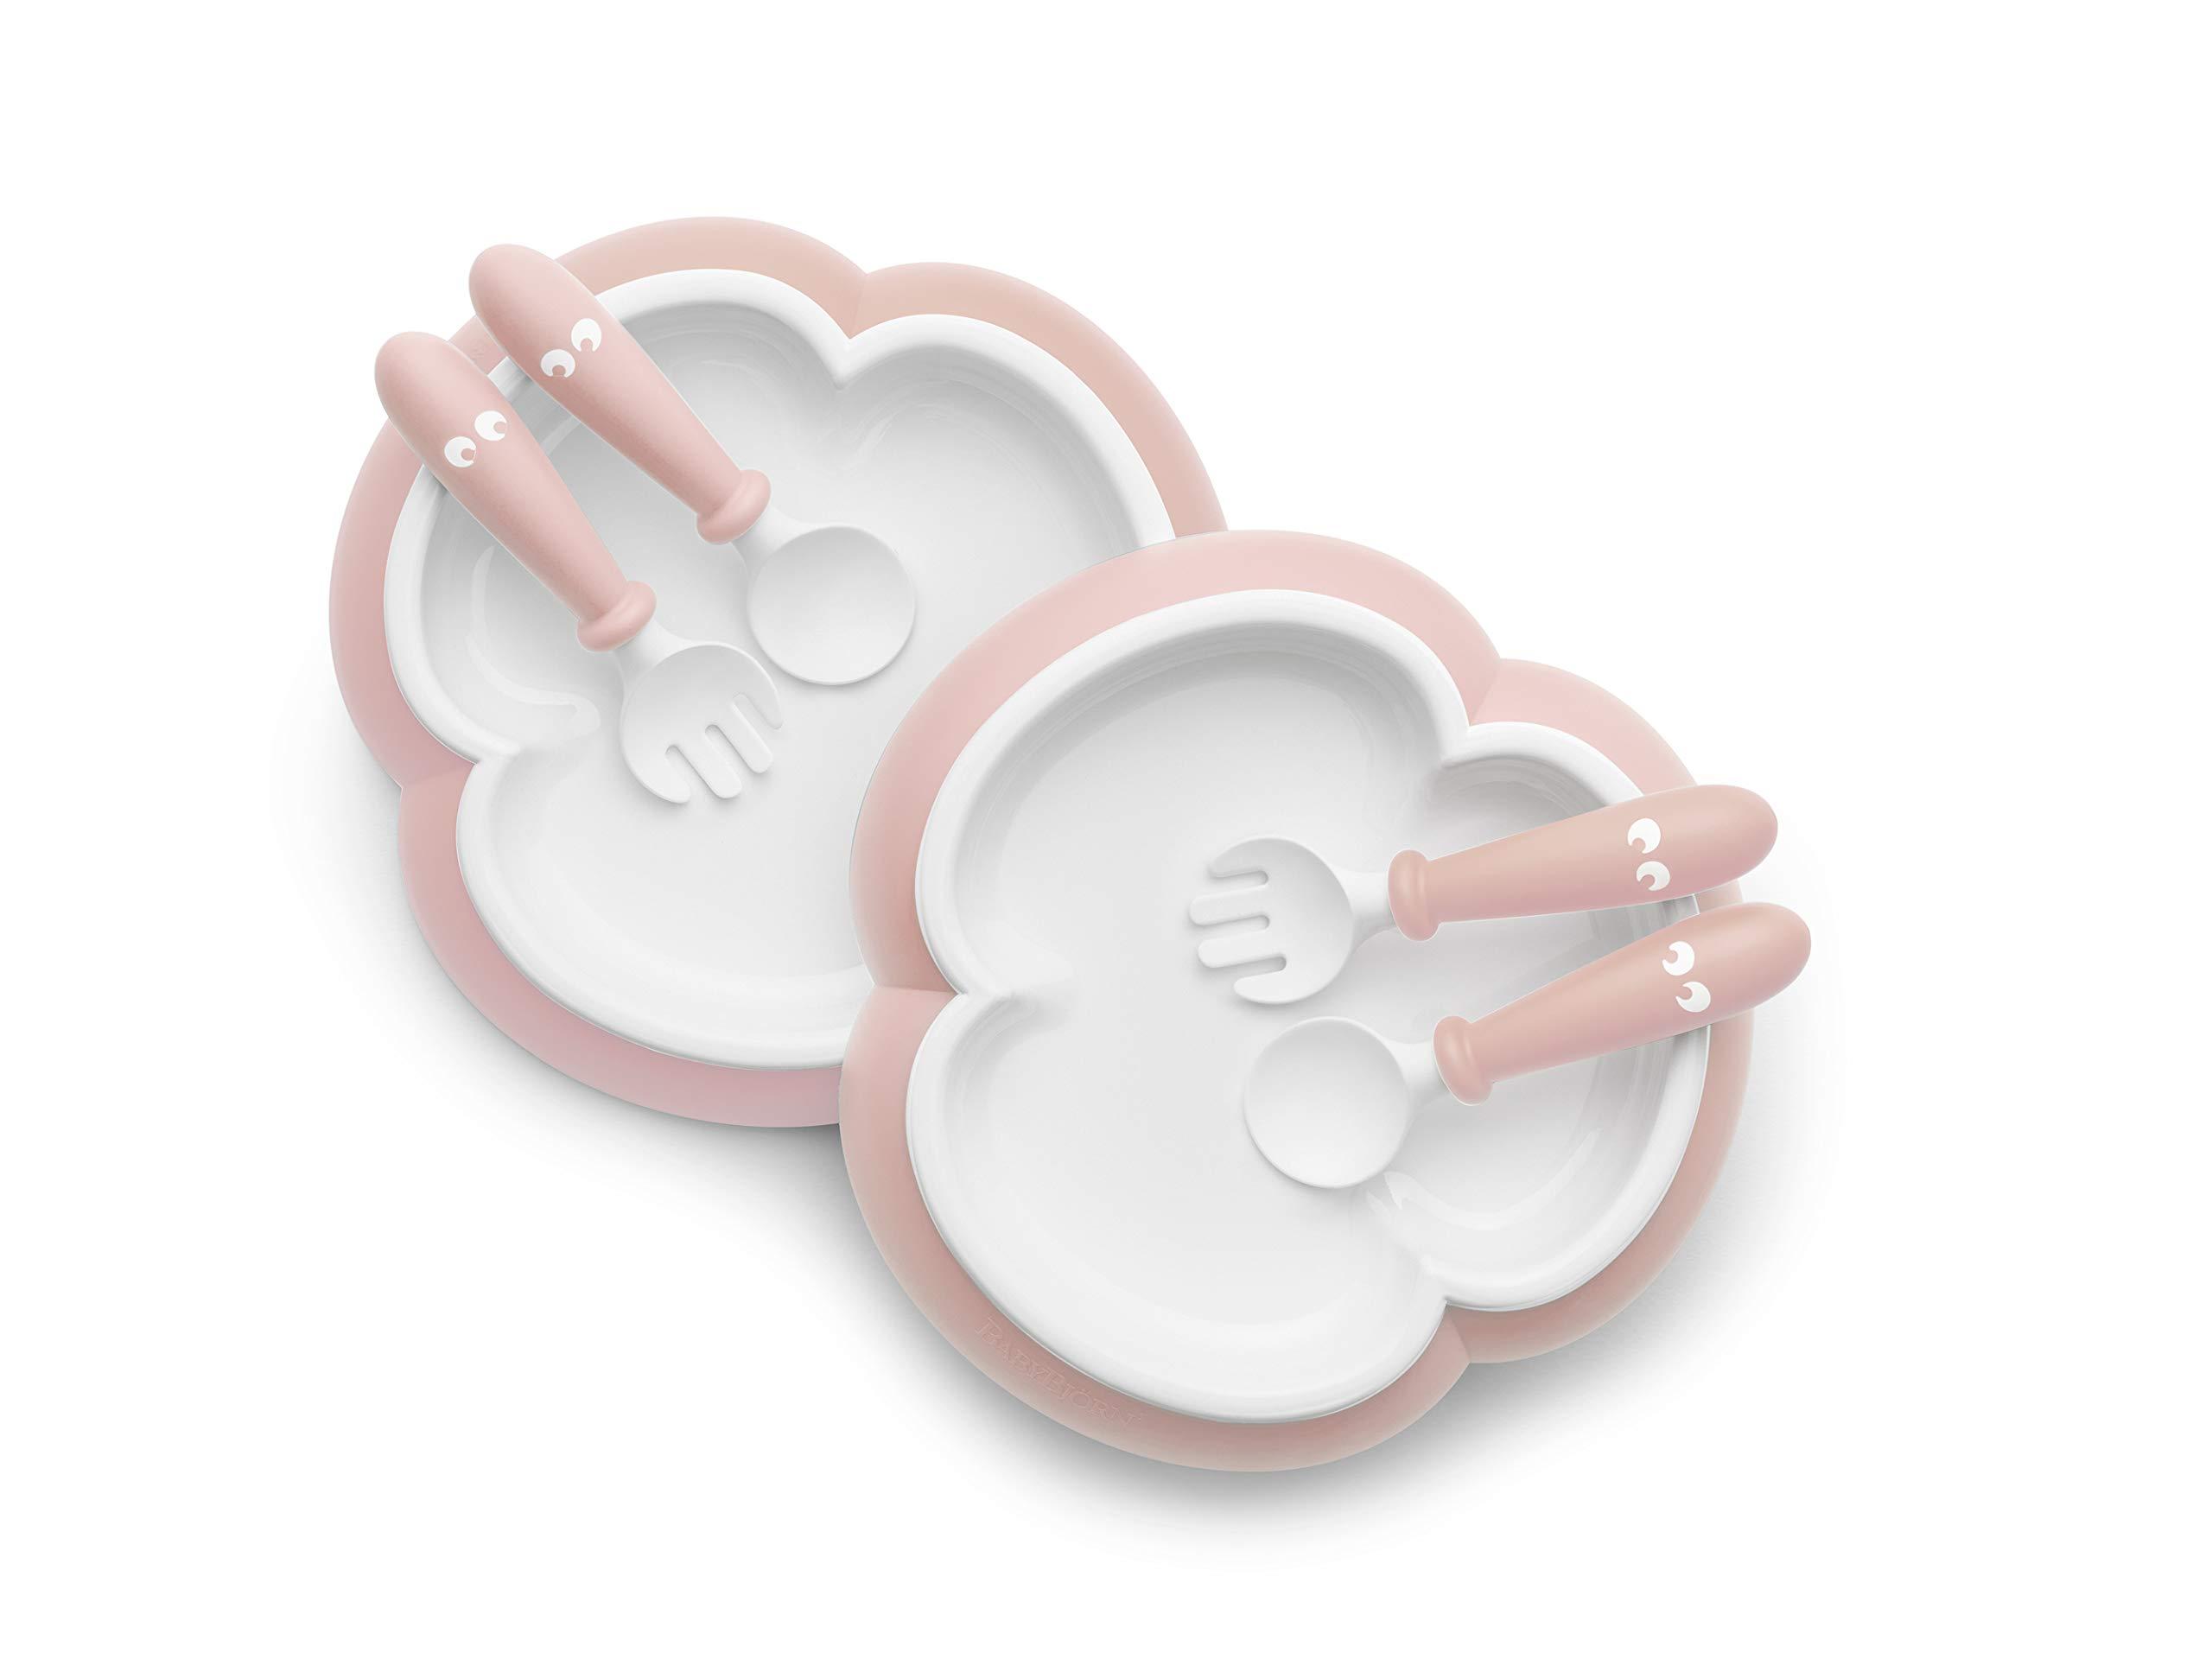 BABYBJÖRN 婴儿餐盘,勺子和叉子,2 套 粉红色